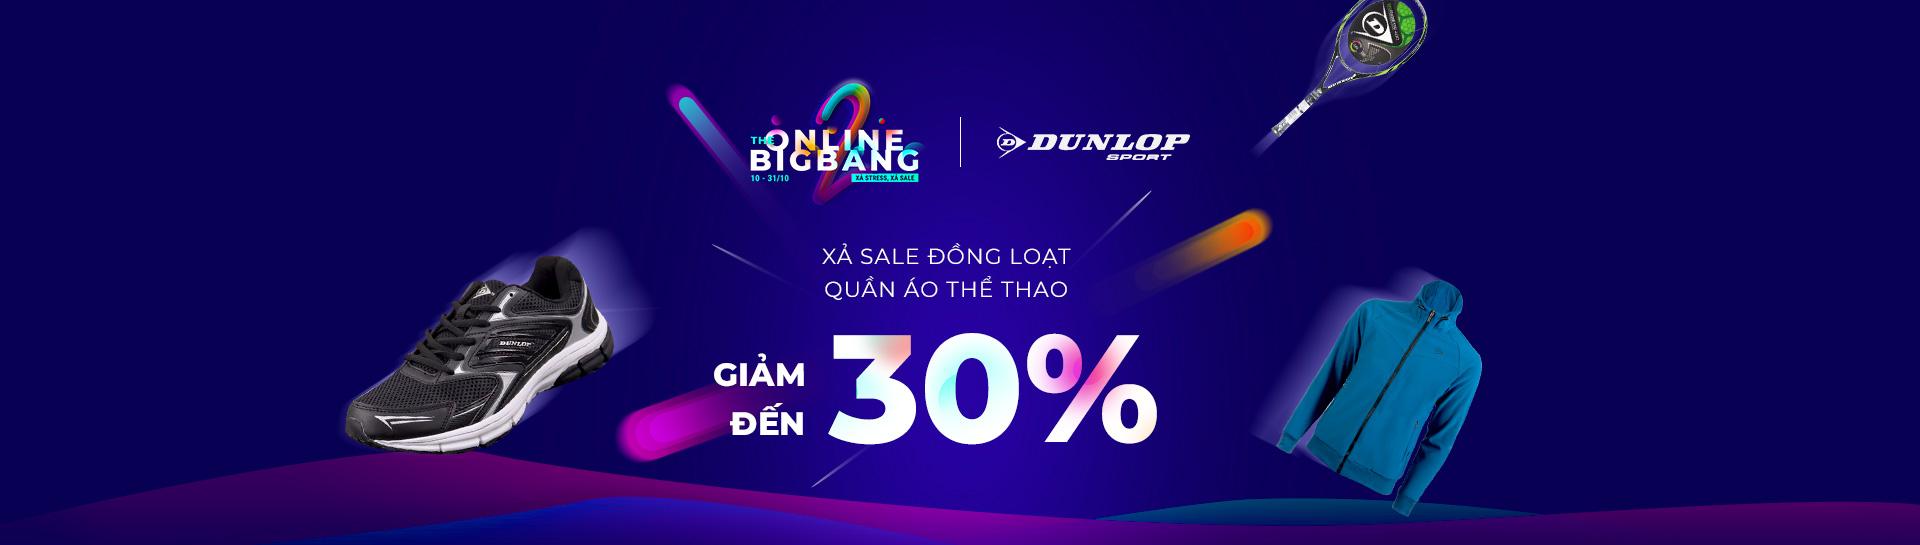 Dunlop - Giảm giá đến 30%